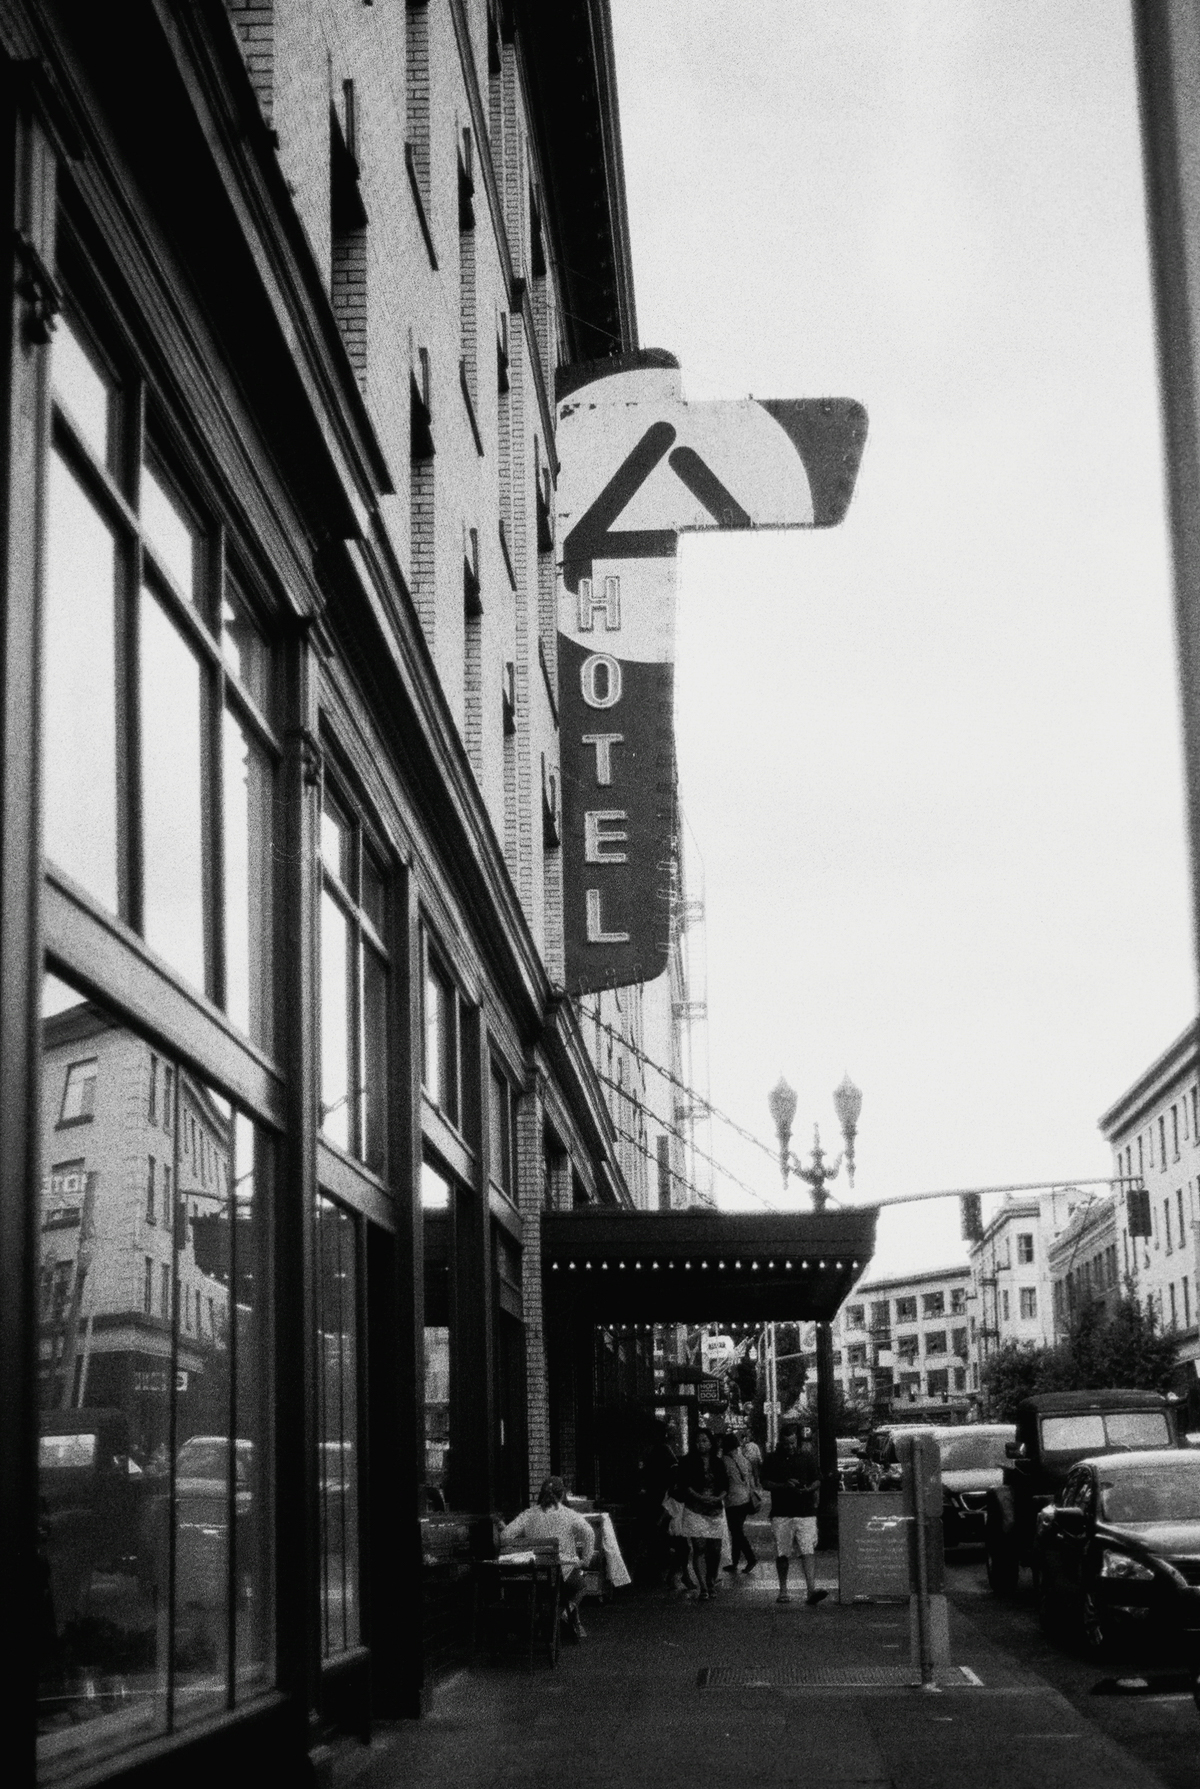 Ace Hotel Portland |Black and White Film Photography by Azzari Jarrett